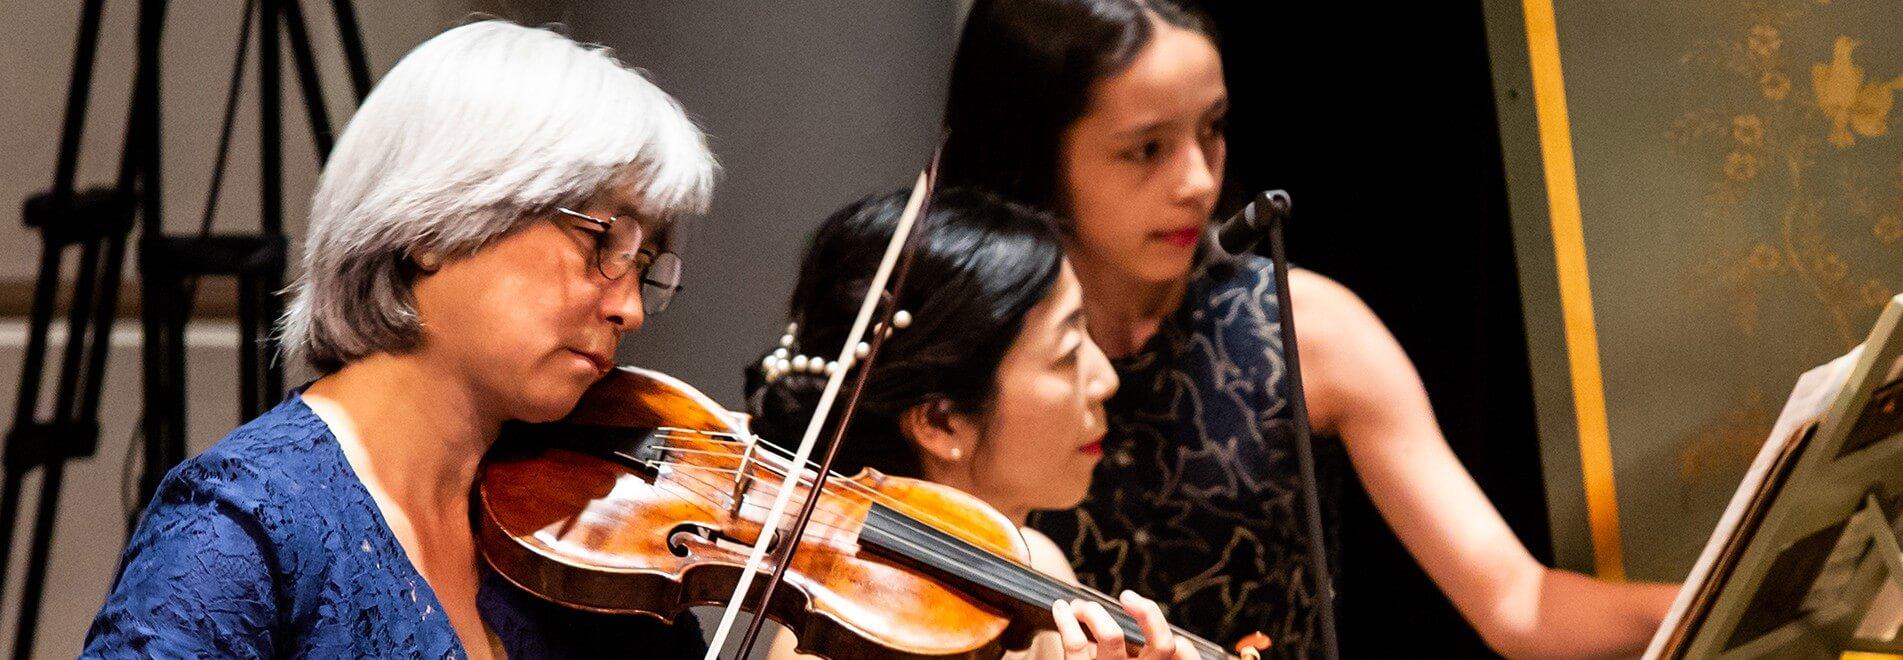 Pearls in Baroque presenteert Bachs Brandenburgse concert nr. 5